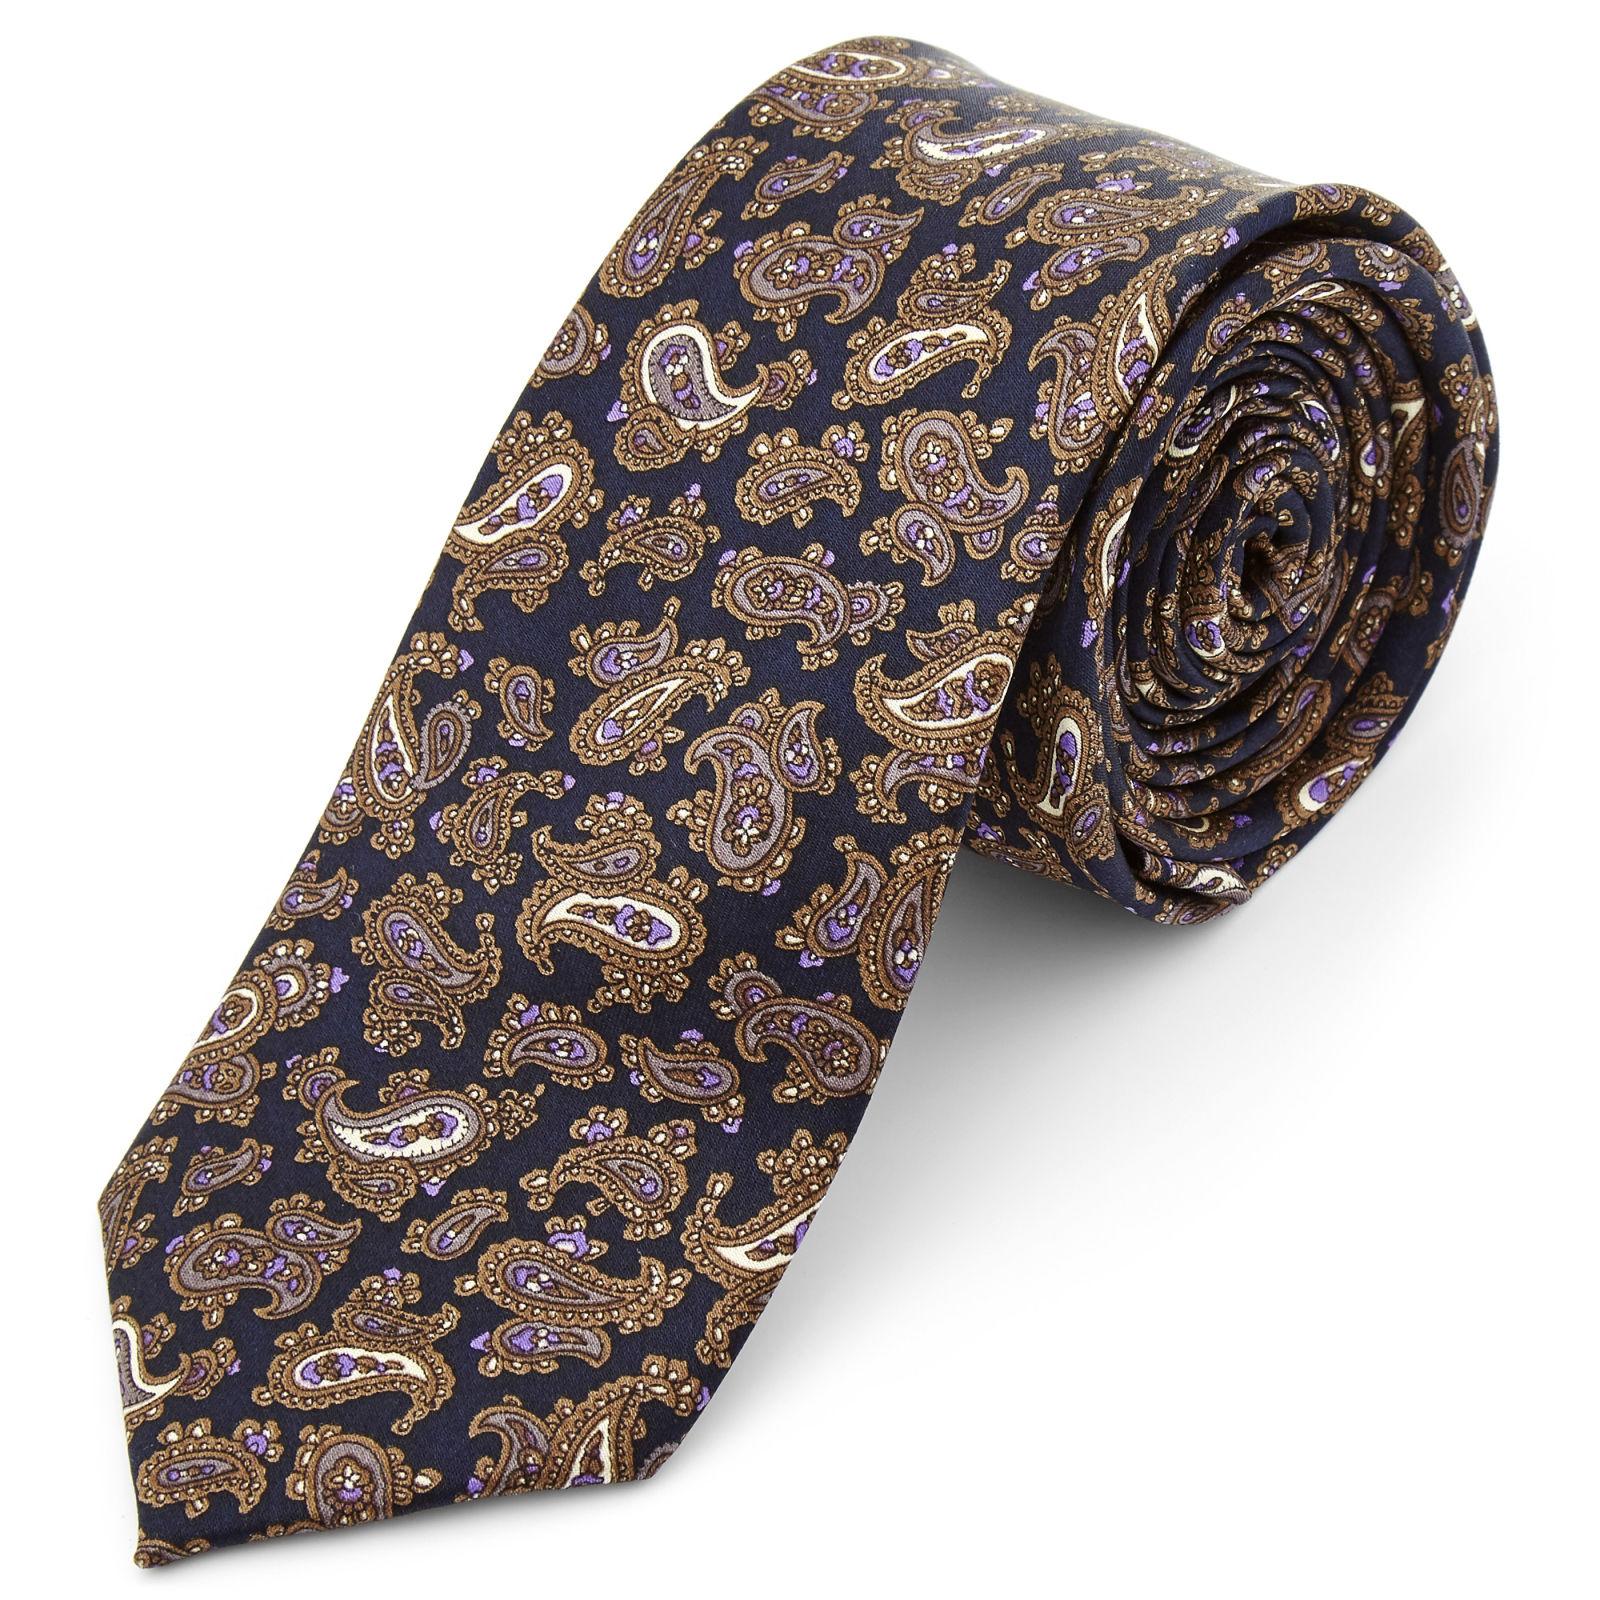 Brun Et Violet Paisley Cravate En Soie Trendhim RhWcx5ryye